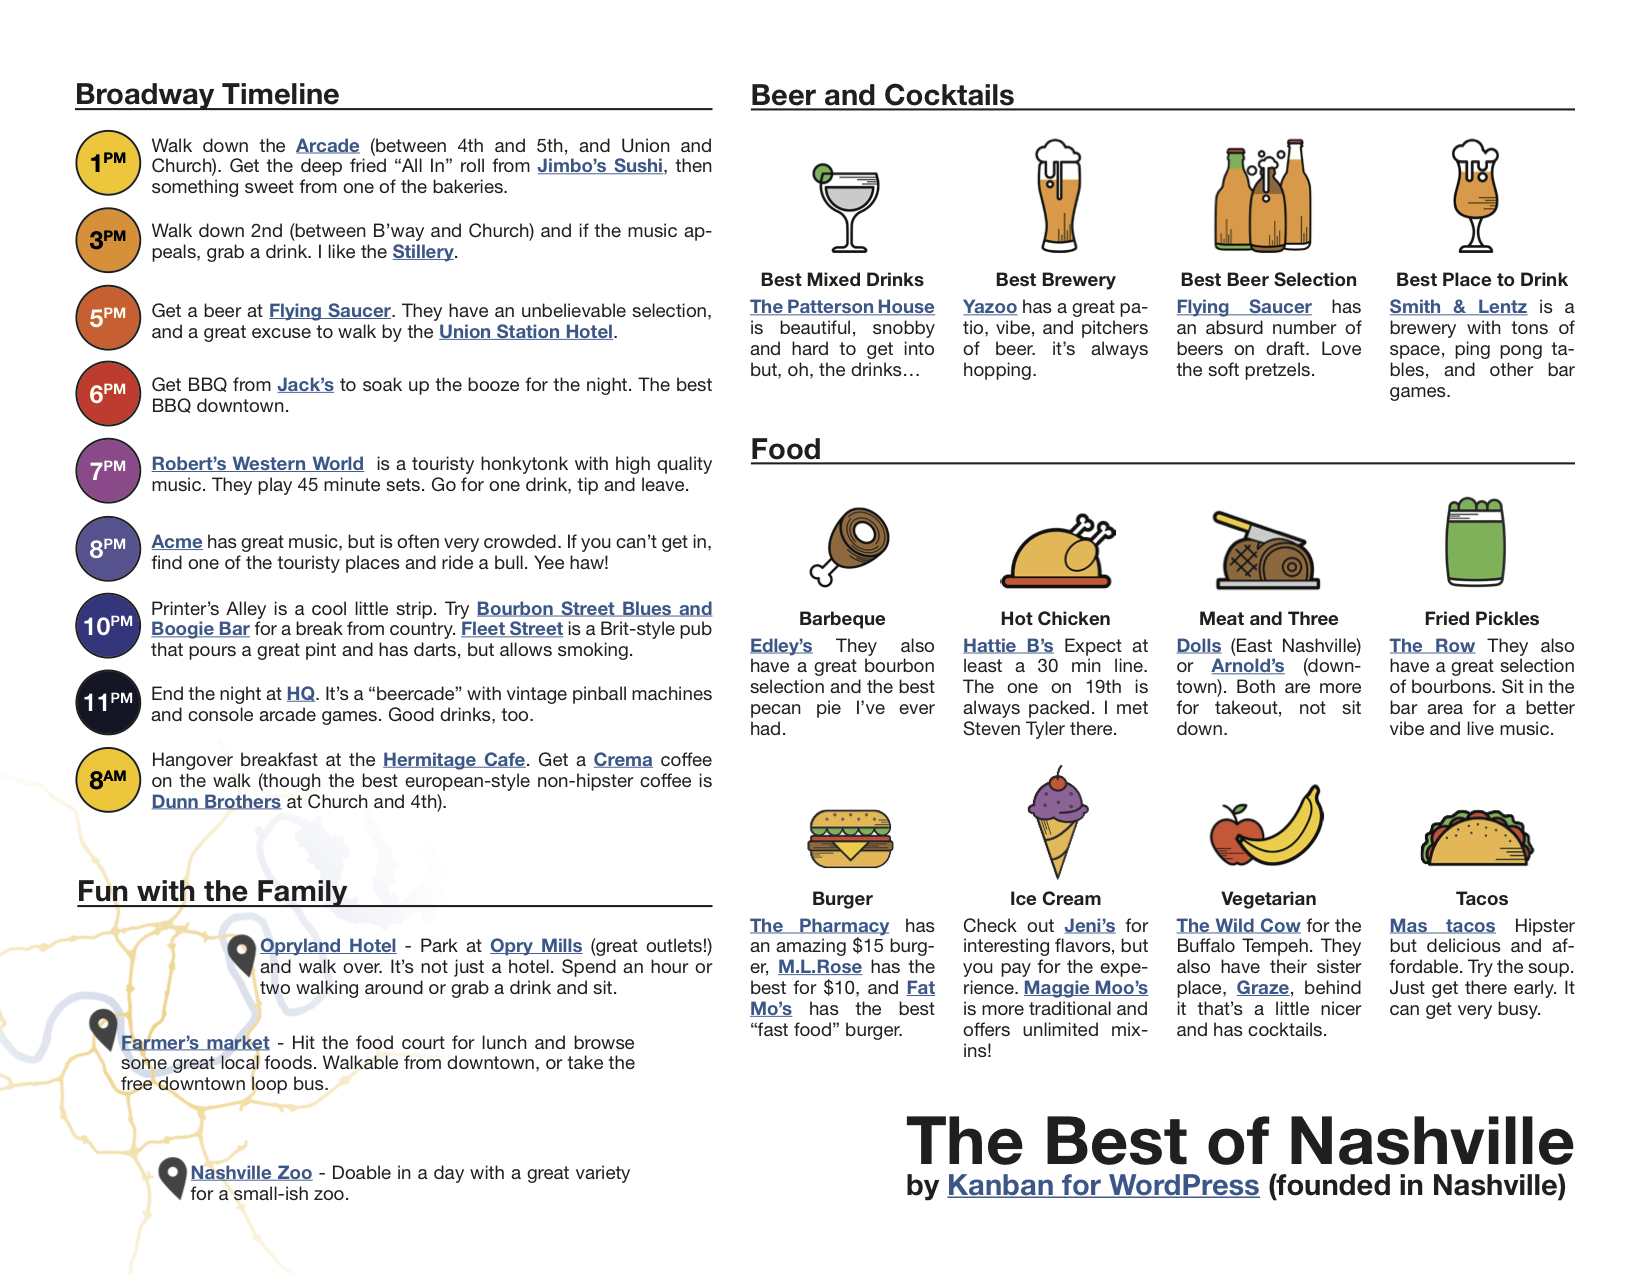 Kanban for WordPress guide to Nashville